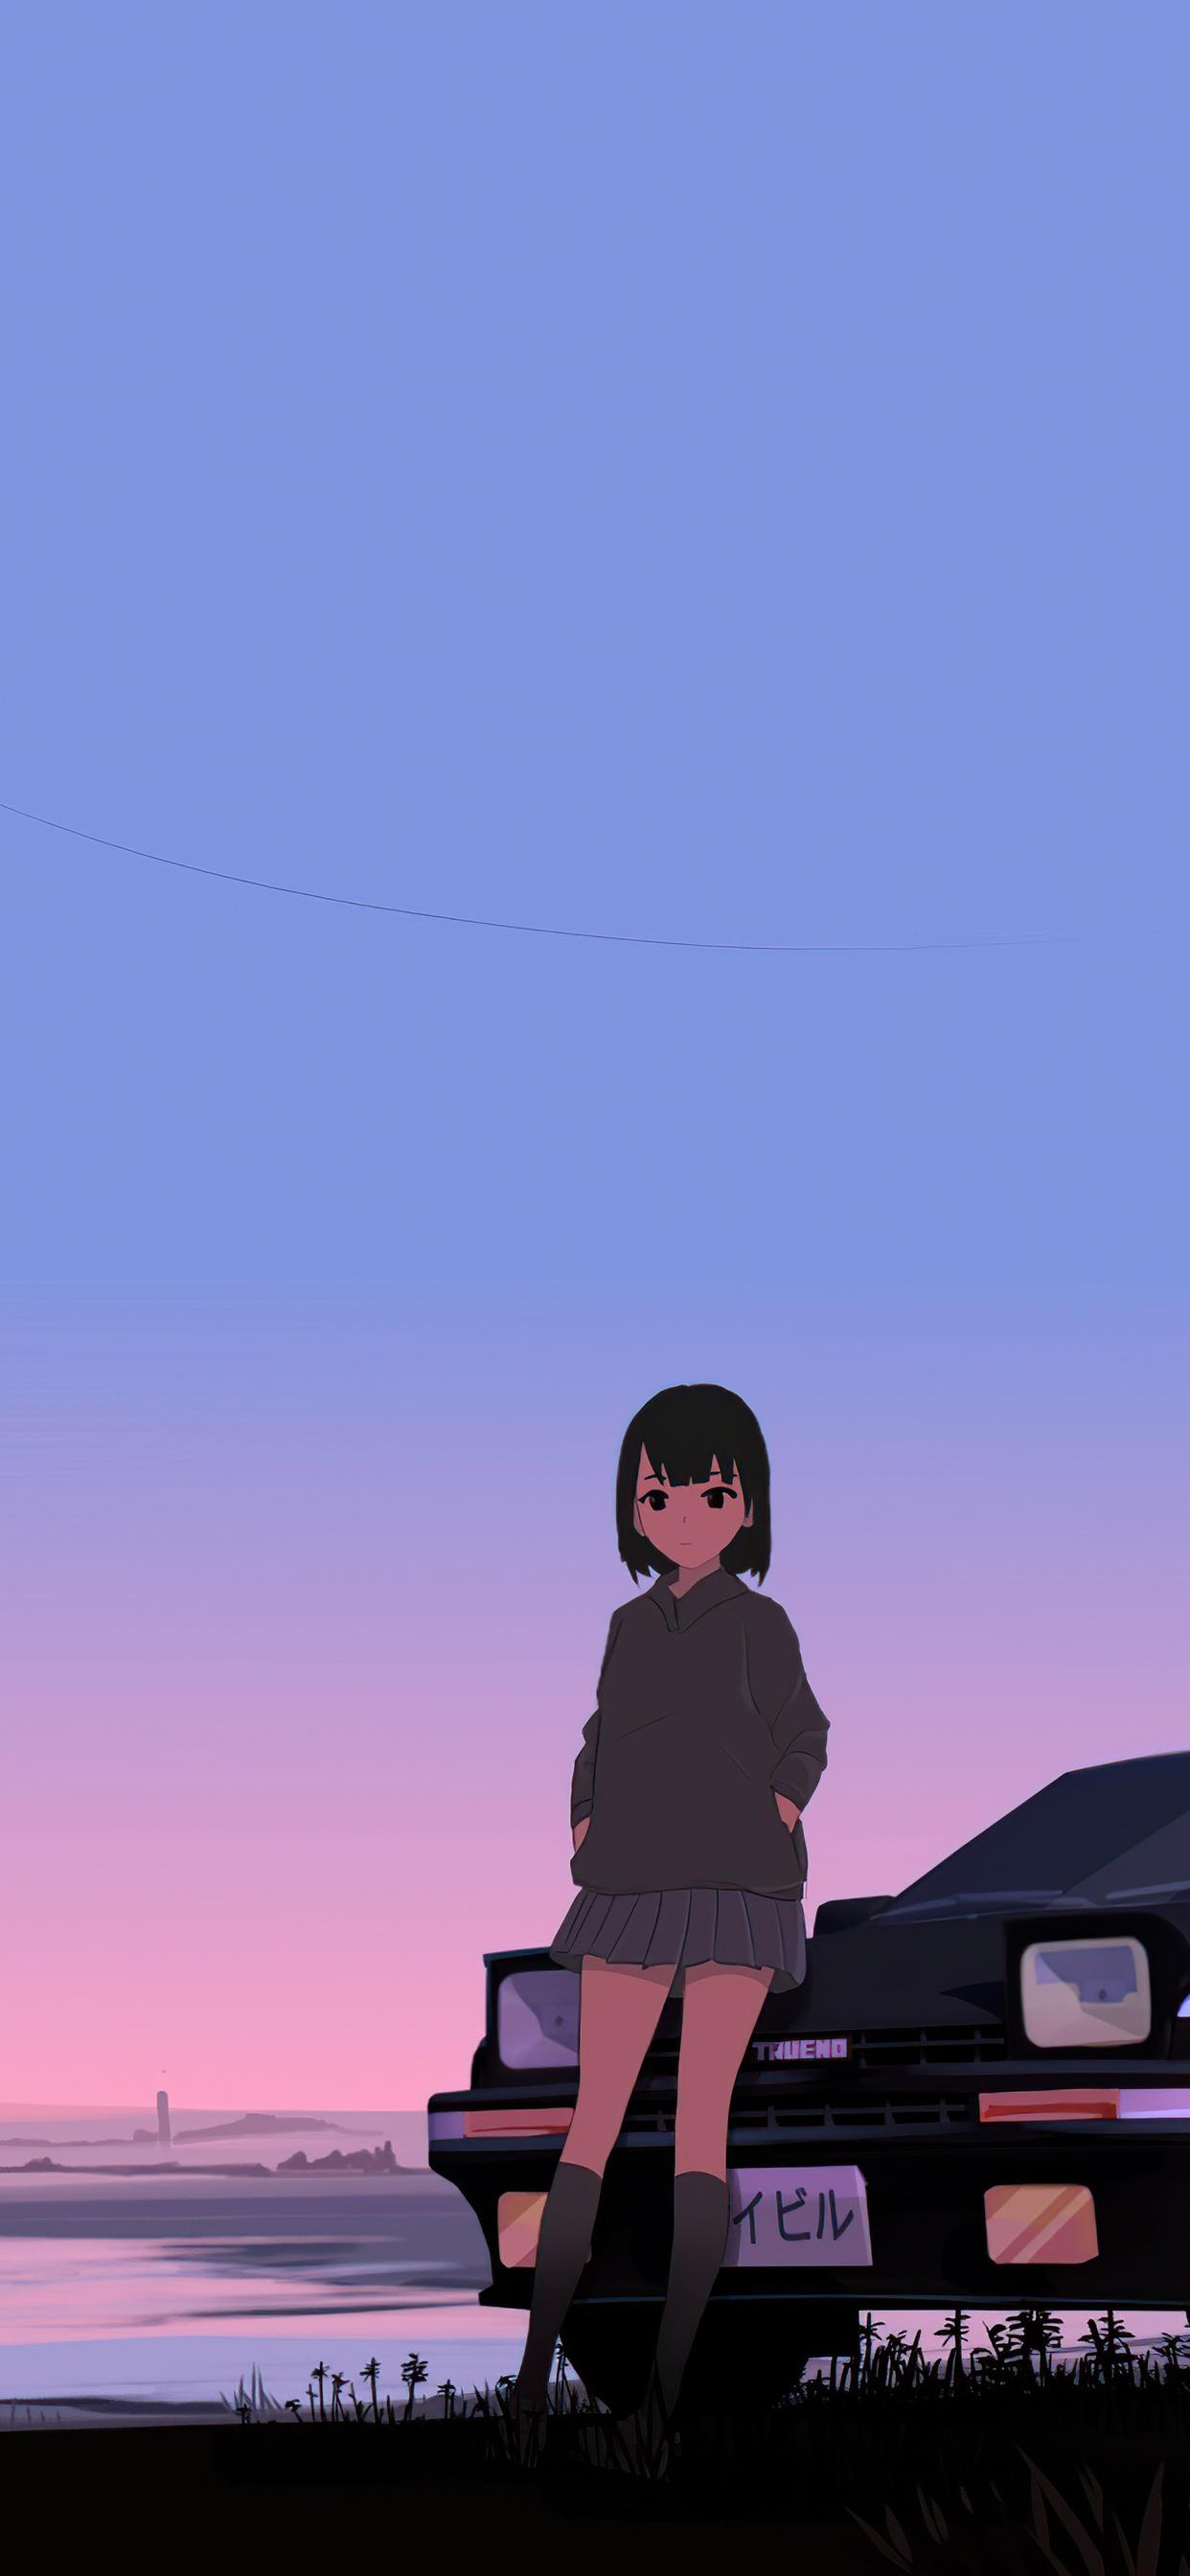 21x21 Initial D Trueno Anime Police Girl 21k Iphone XS MAX HD ...